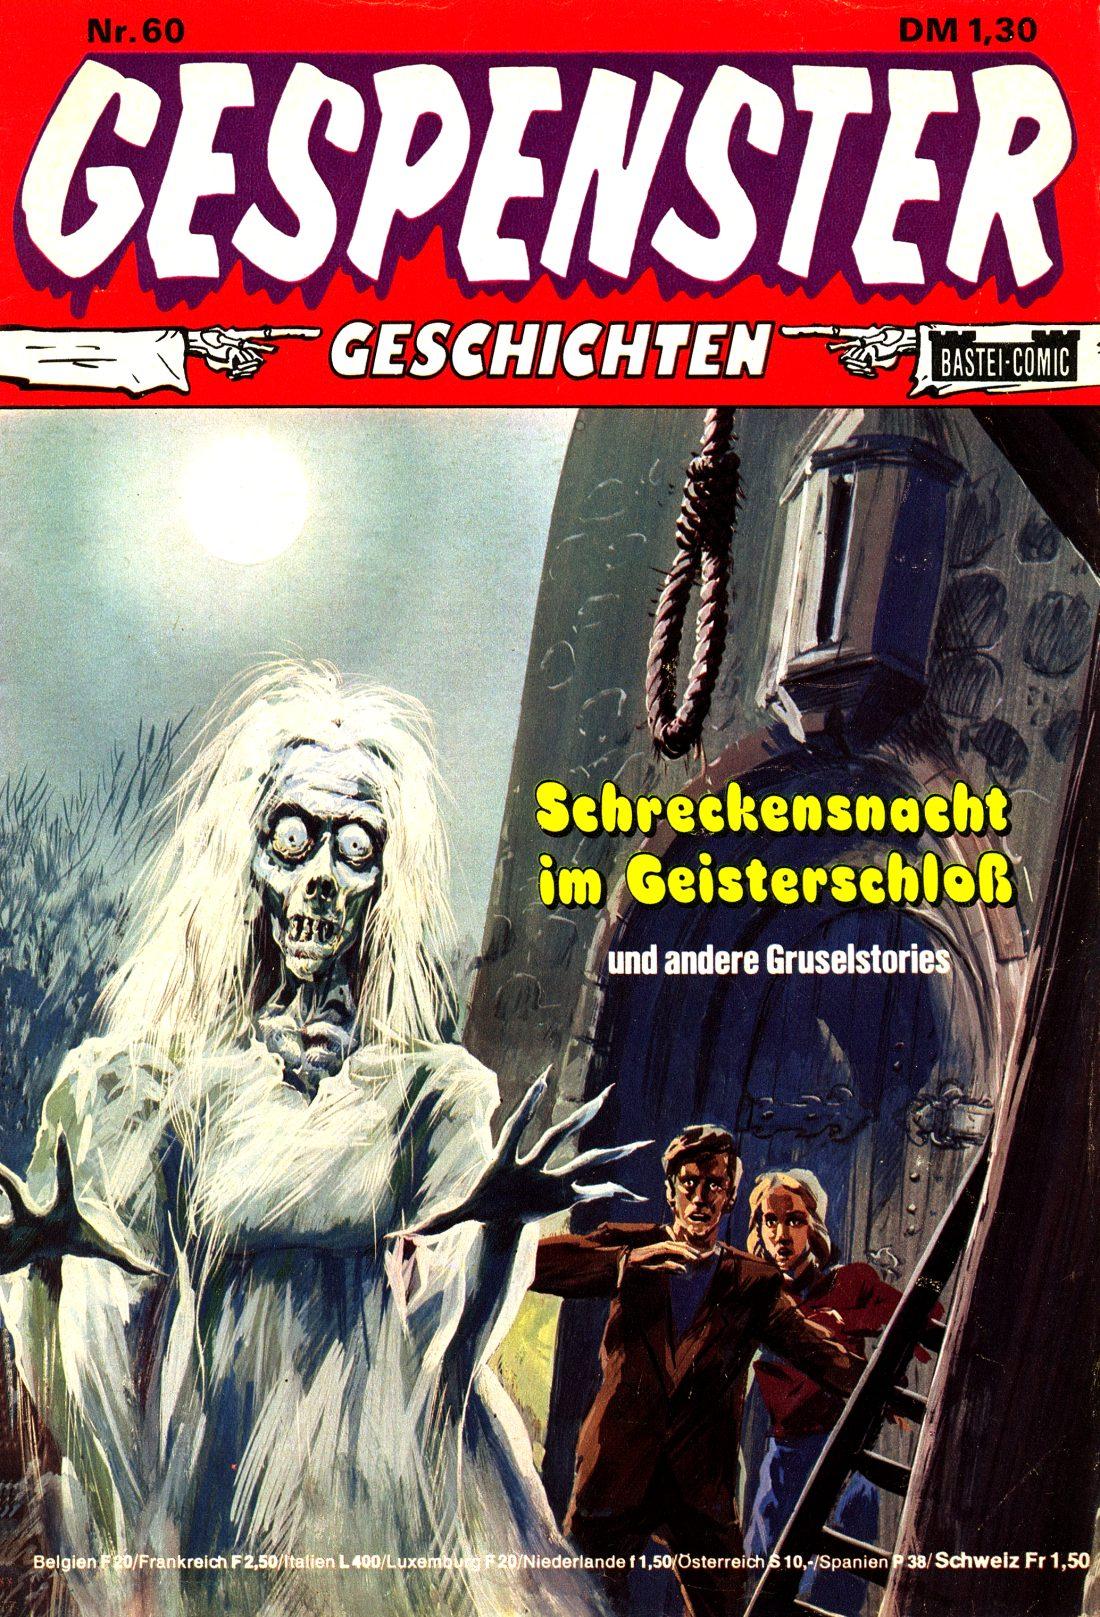 Gespenster Geschichten - 60